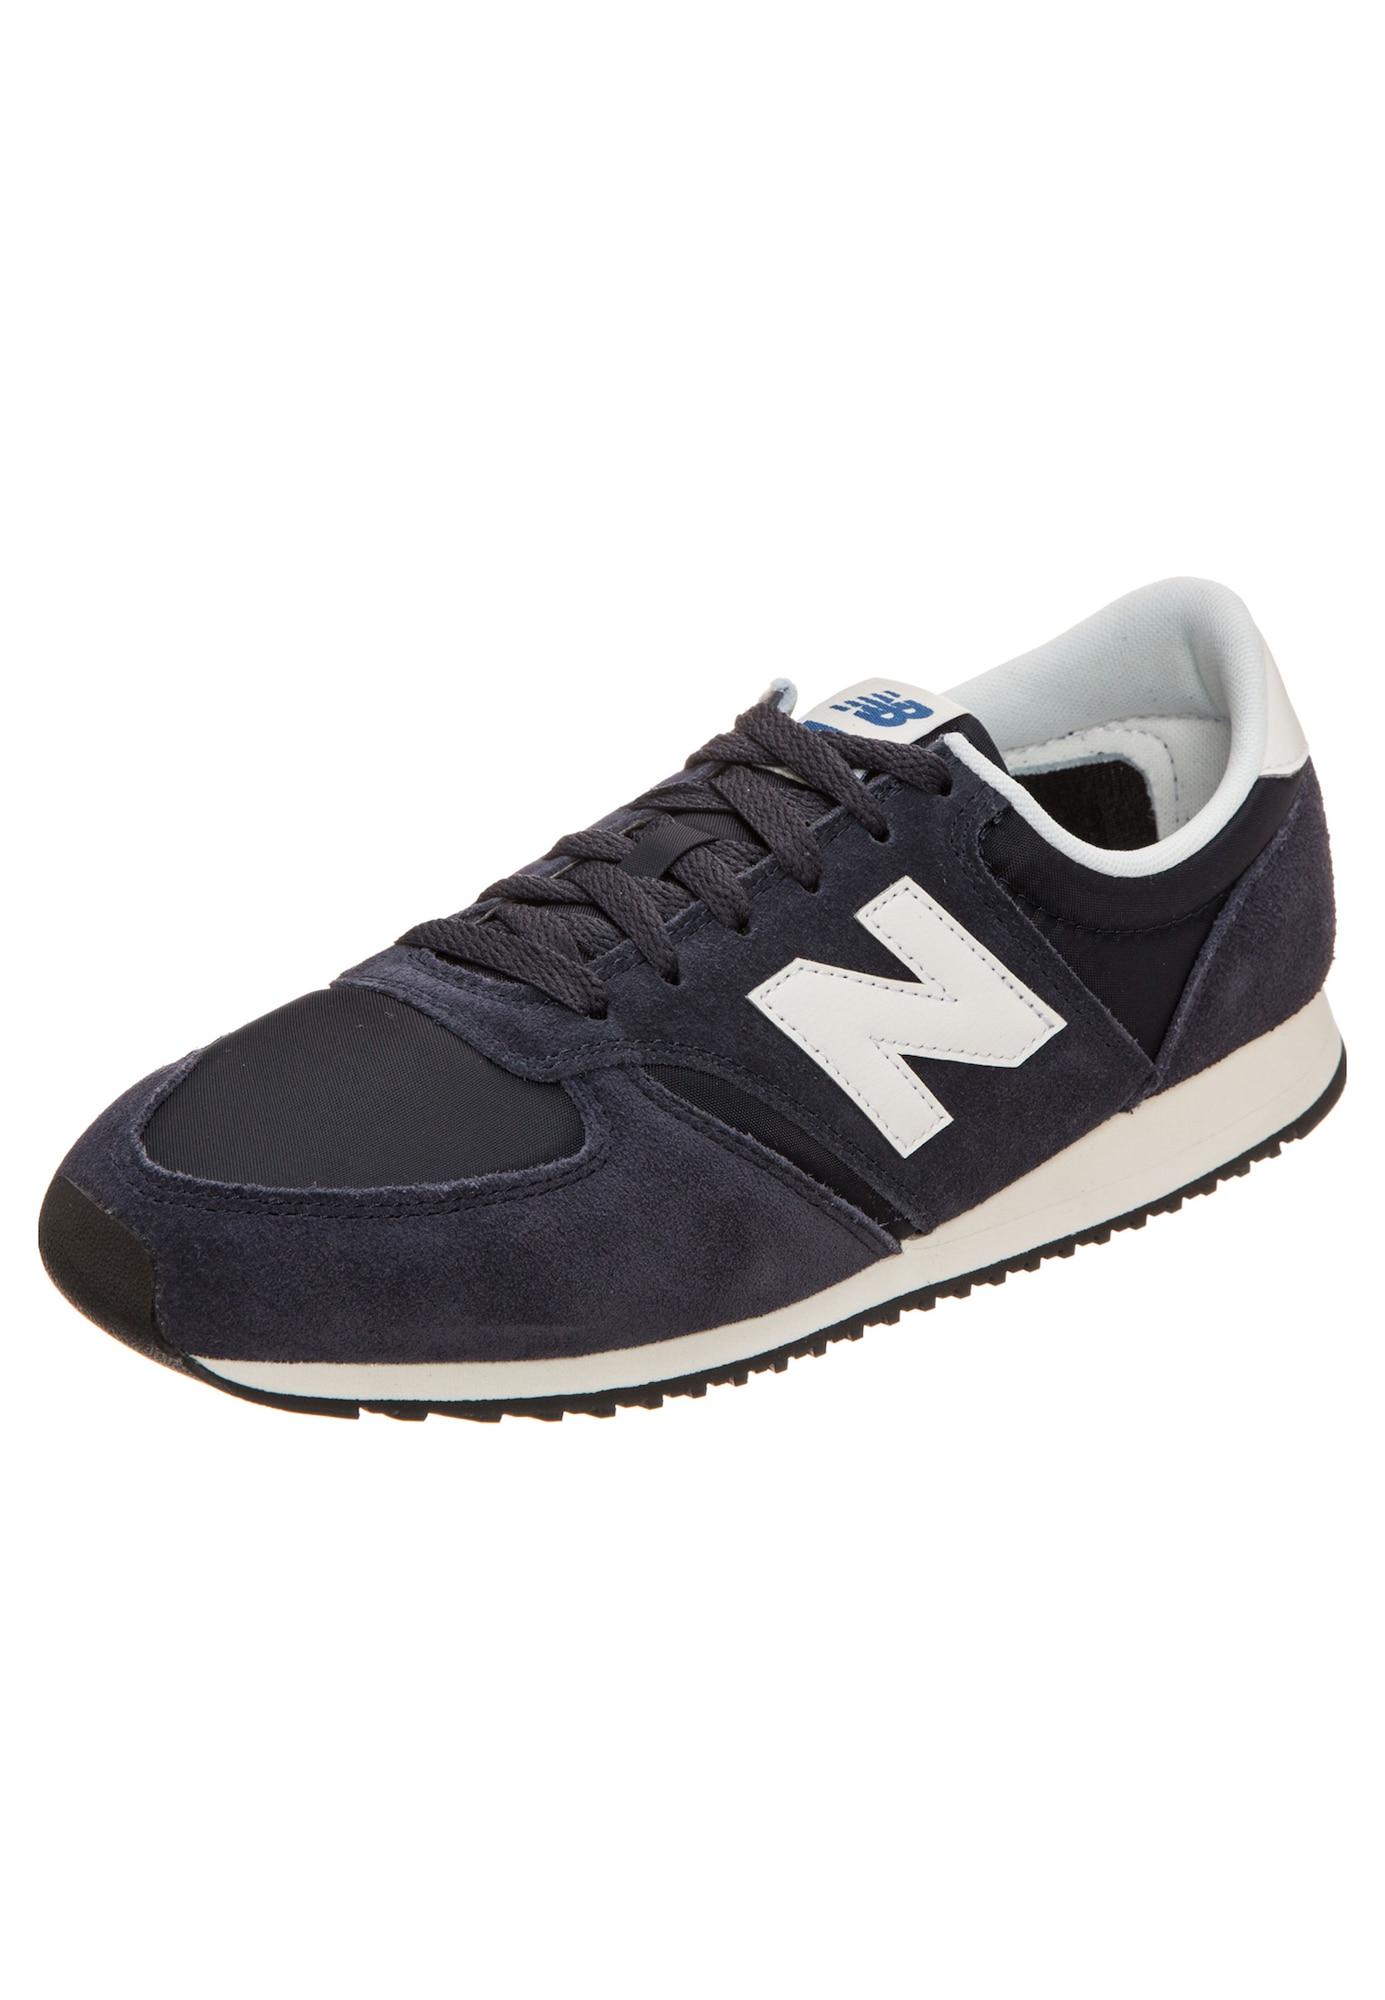 New Balance, Heren Sneakers laag 'U420-NVB-D', nachtblauw